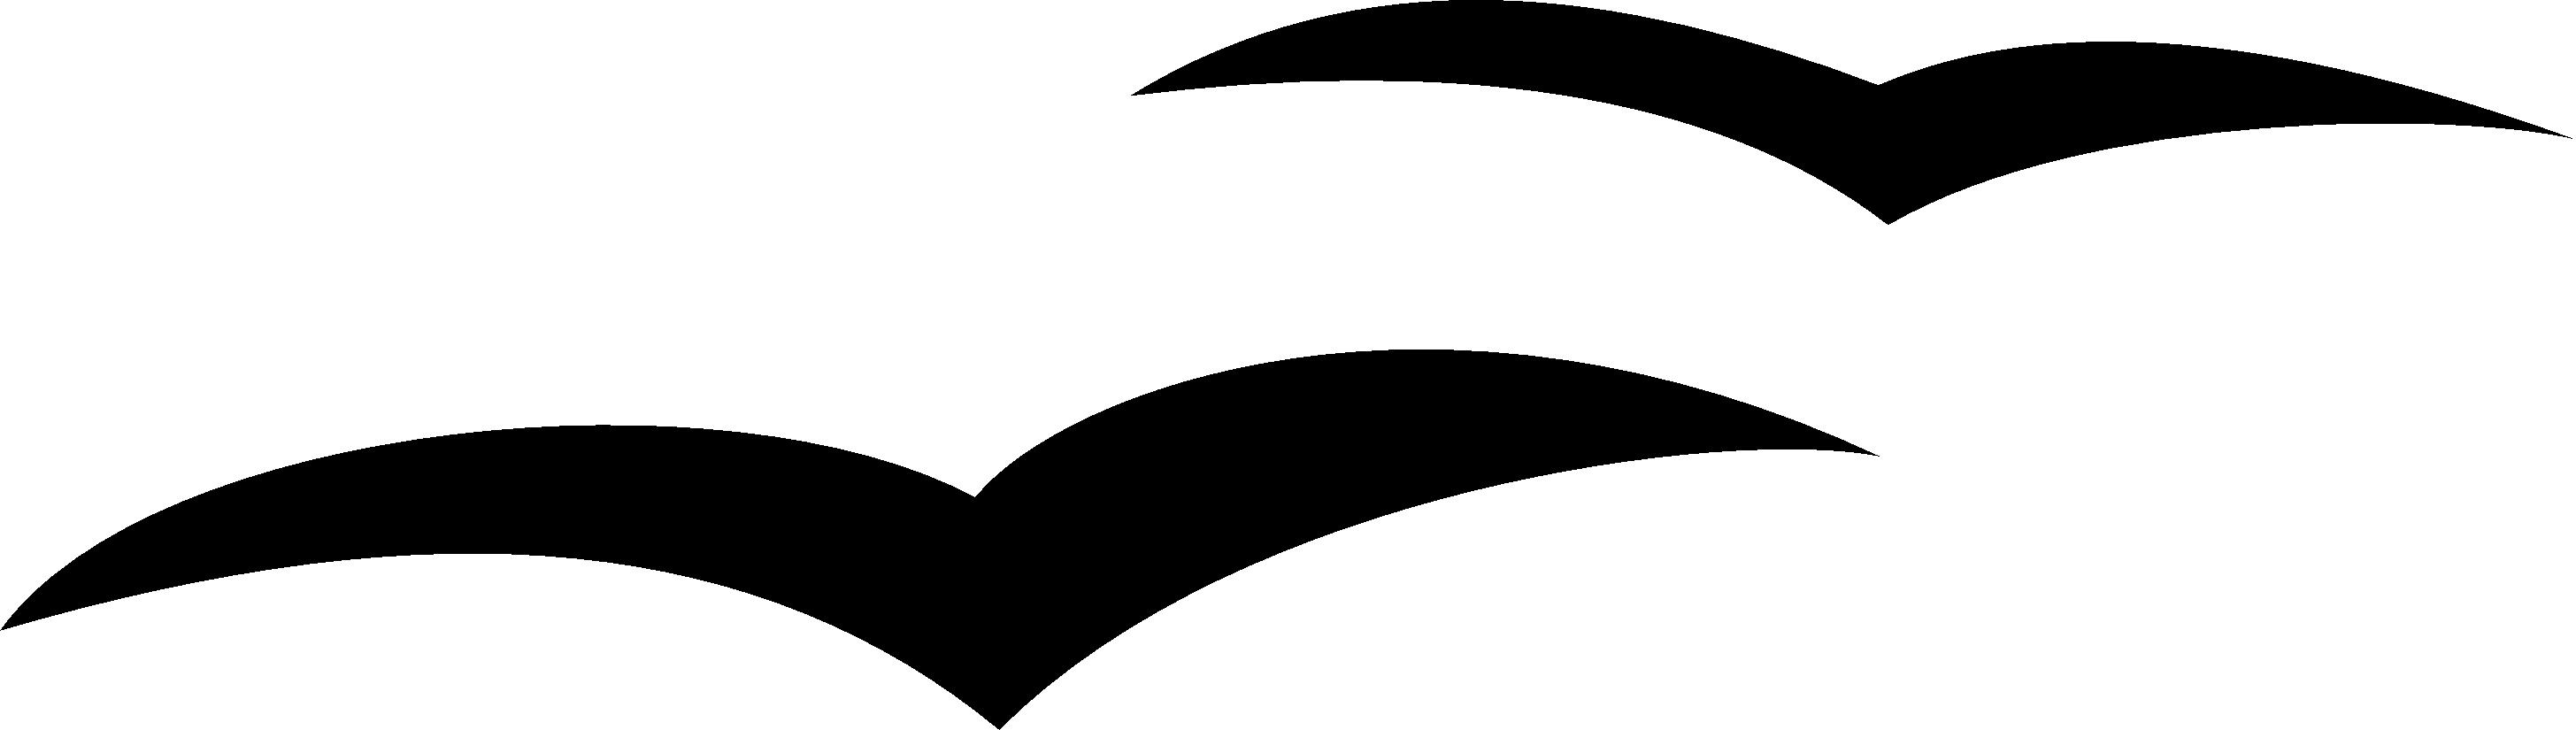 Black seagull clipart no background clipartfest